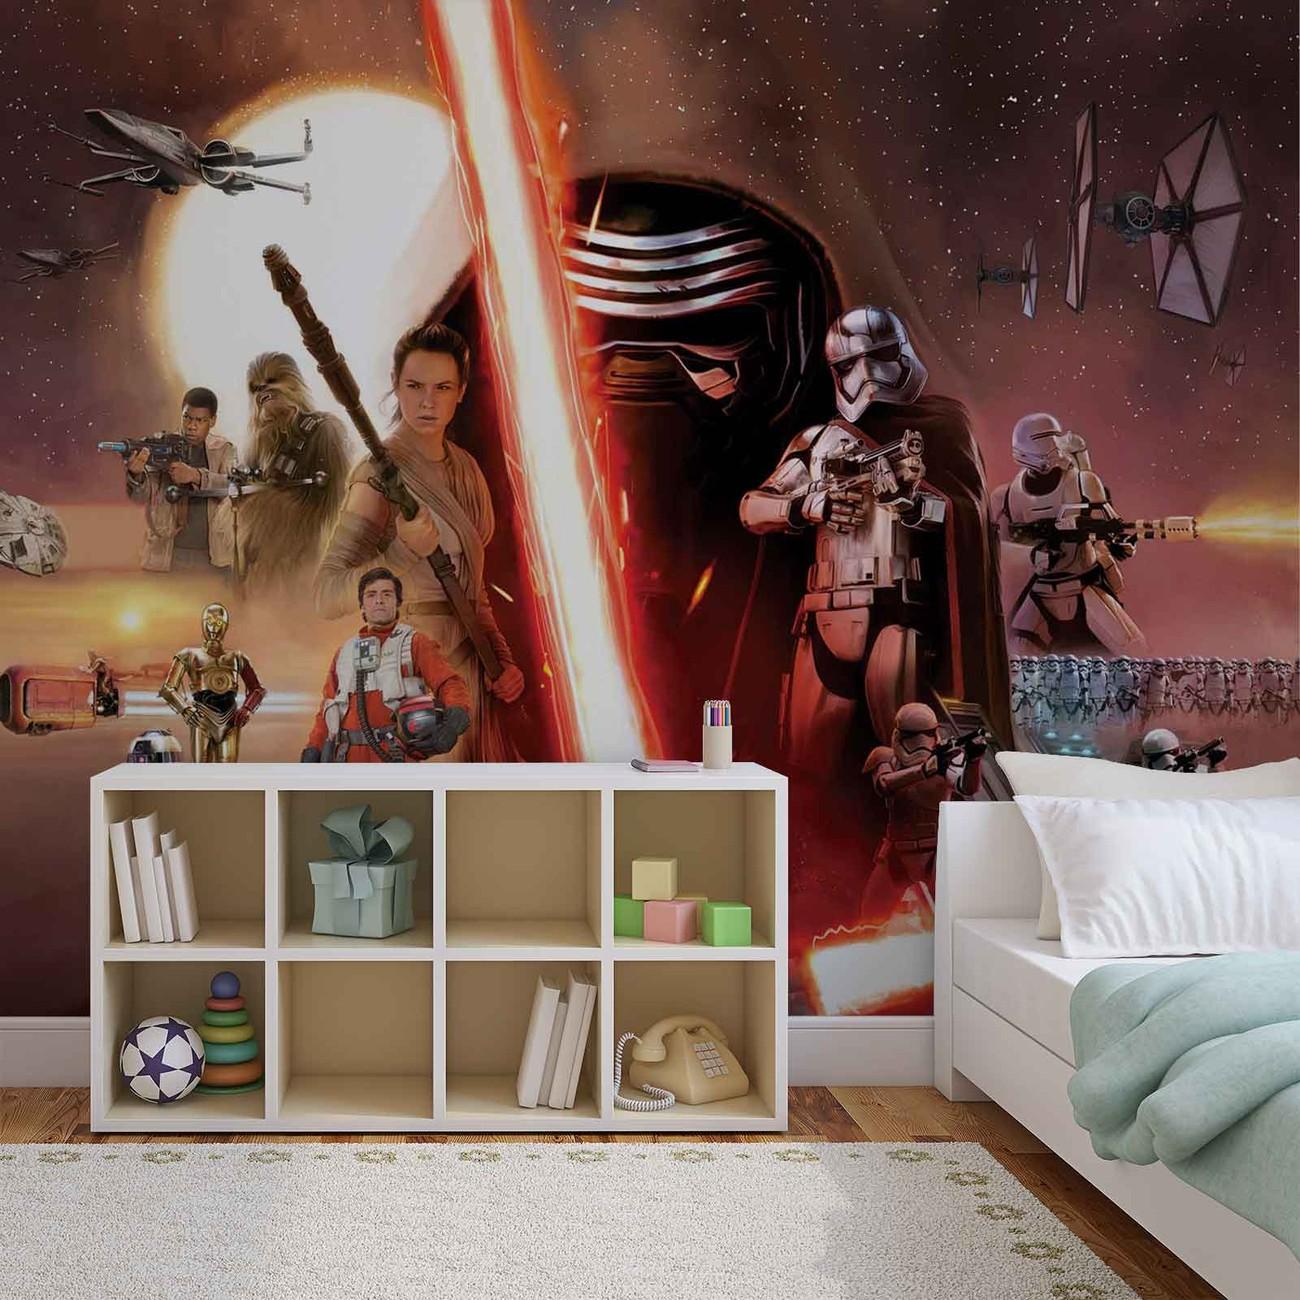 Star wars le r veil de la force poster mural papier peint for Star wars kinderzimmer